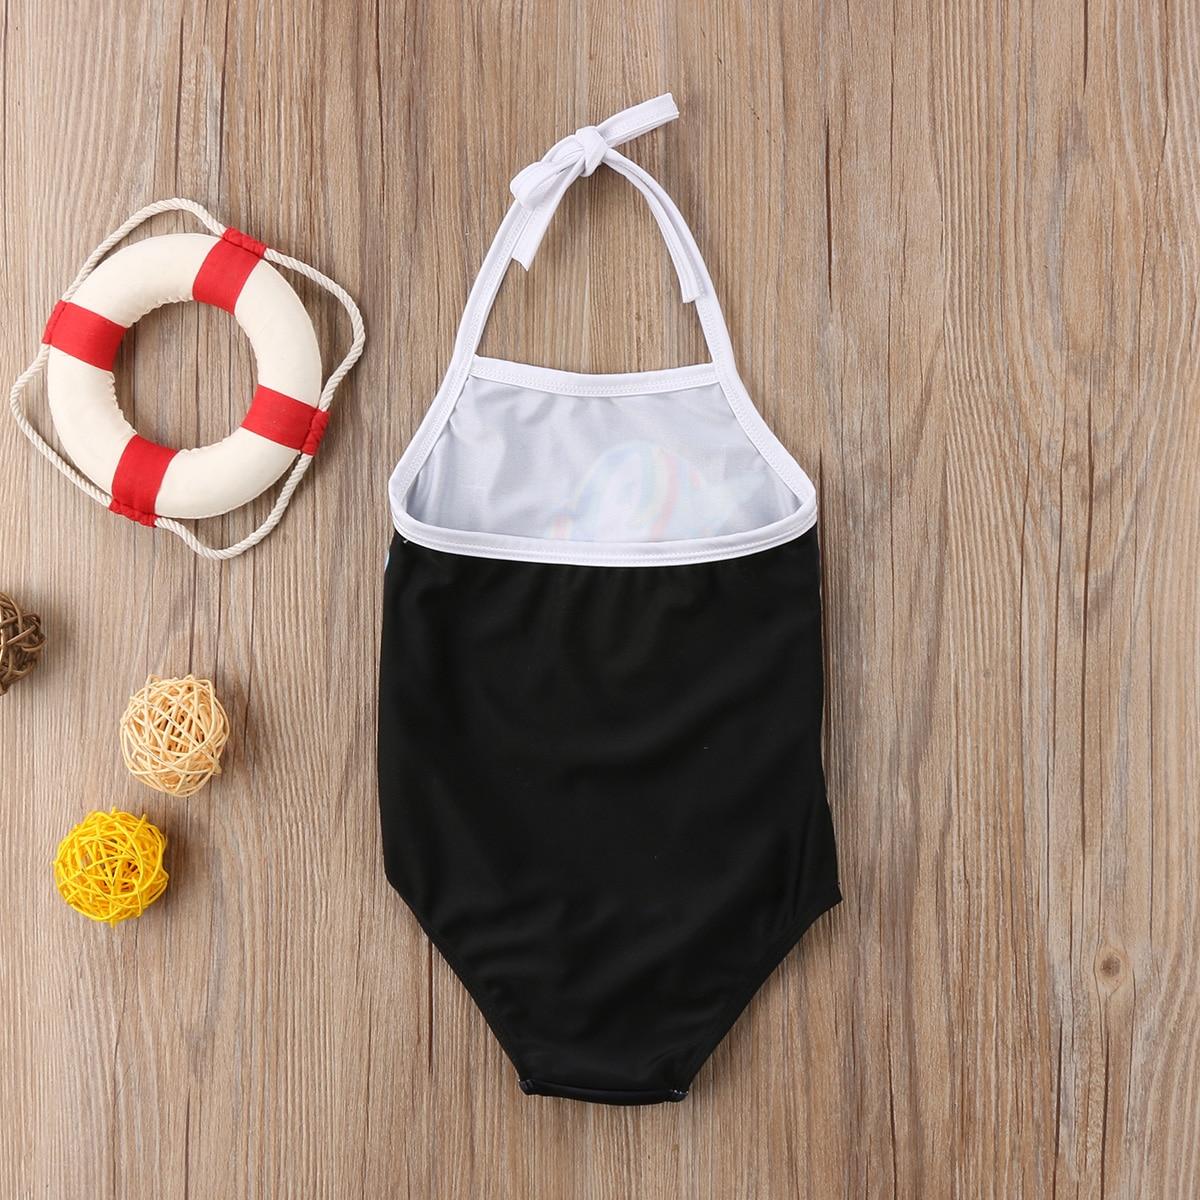 Cartoon Unicorn Baby Girls Swimwear One pieces Bodysuit for children Girls Swimsuit Beachwear Summer Bathing suit for girls